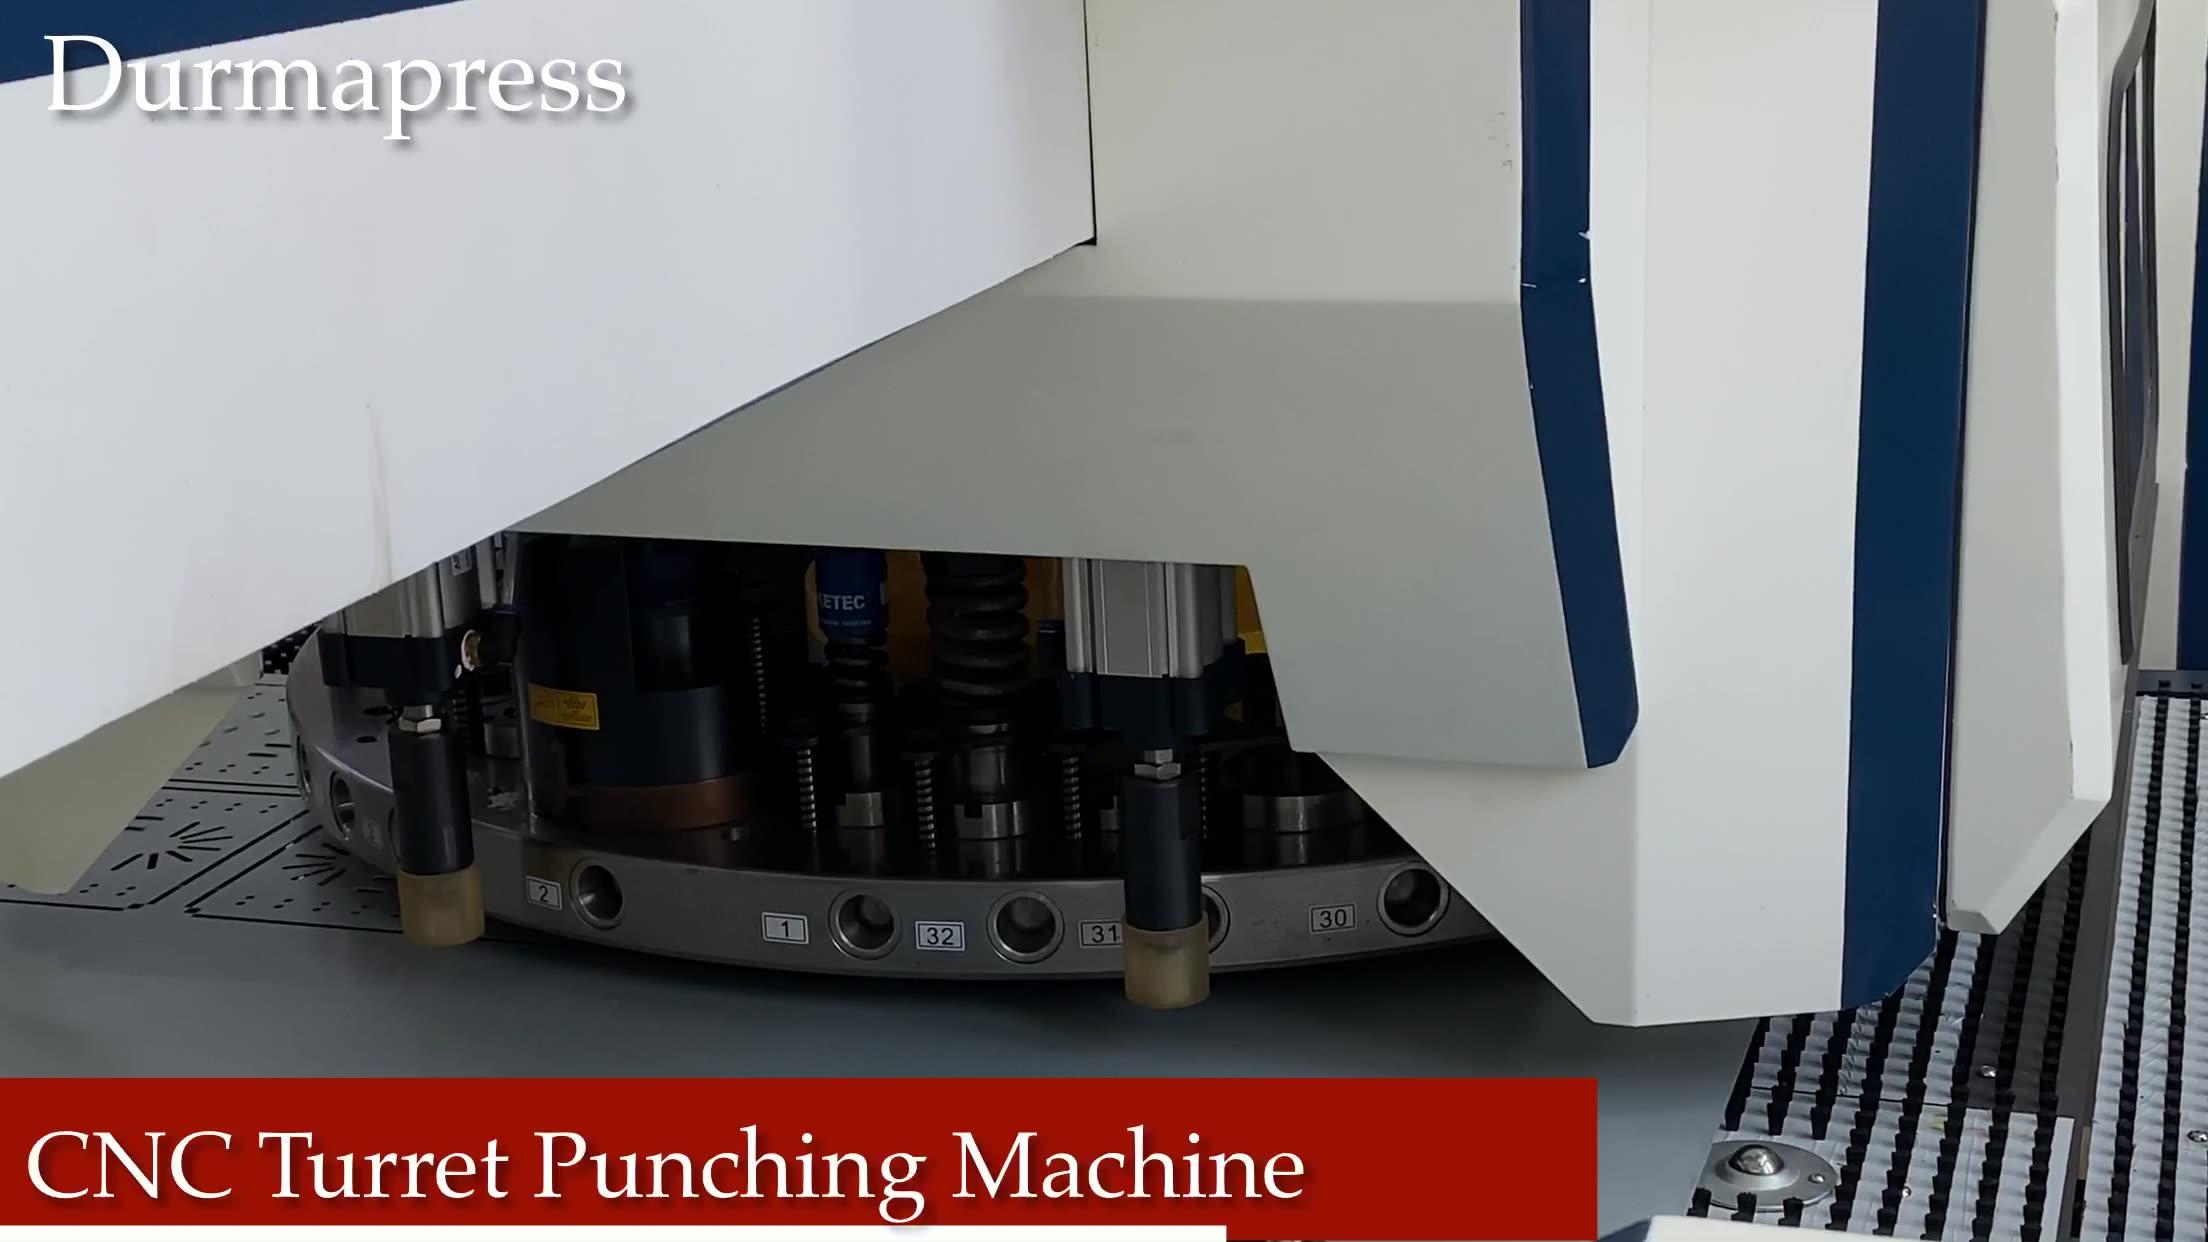 Máquina de punzonado automático Cnc, ojal de cortina, prensa Interior, punzón, torreta, punzonadora, herramientas